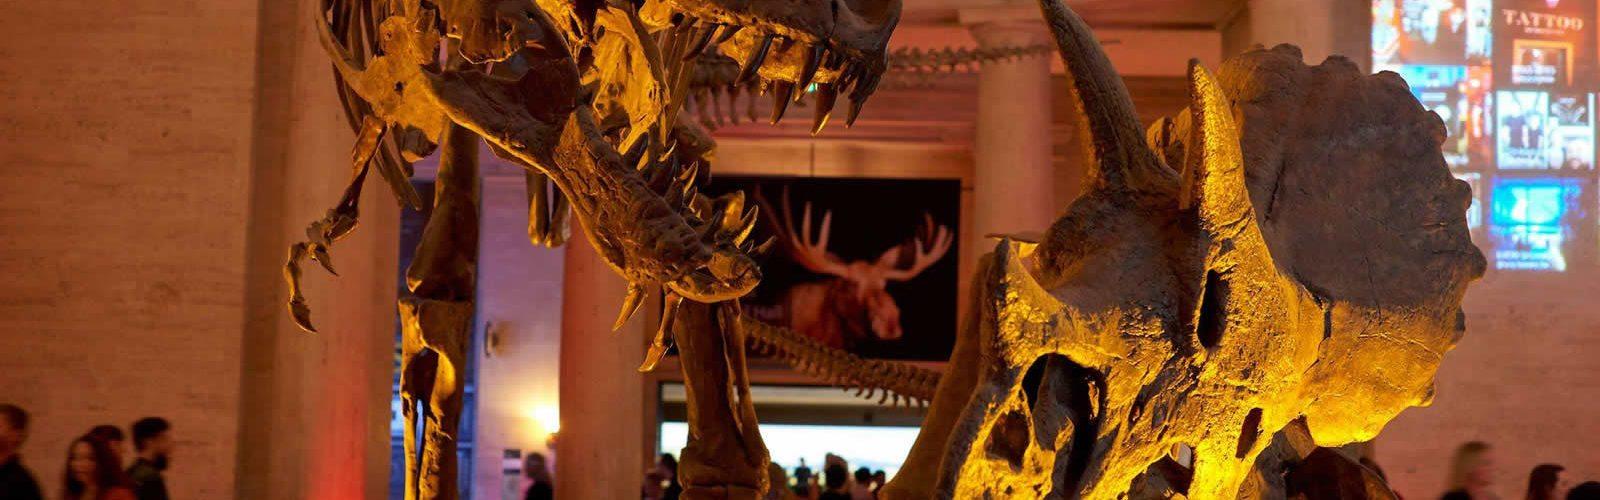 musee-histoire-naturelle-los-angeles-culture-sortie-weekend-visite-une